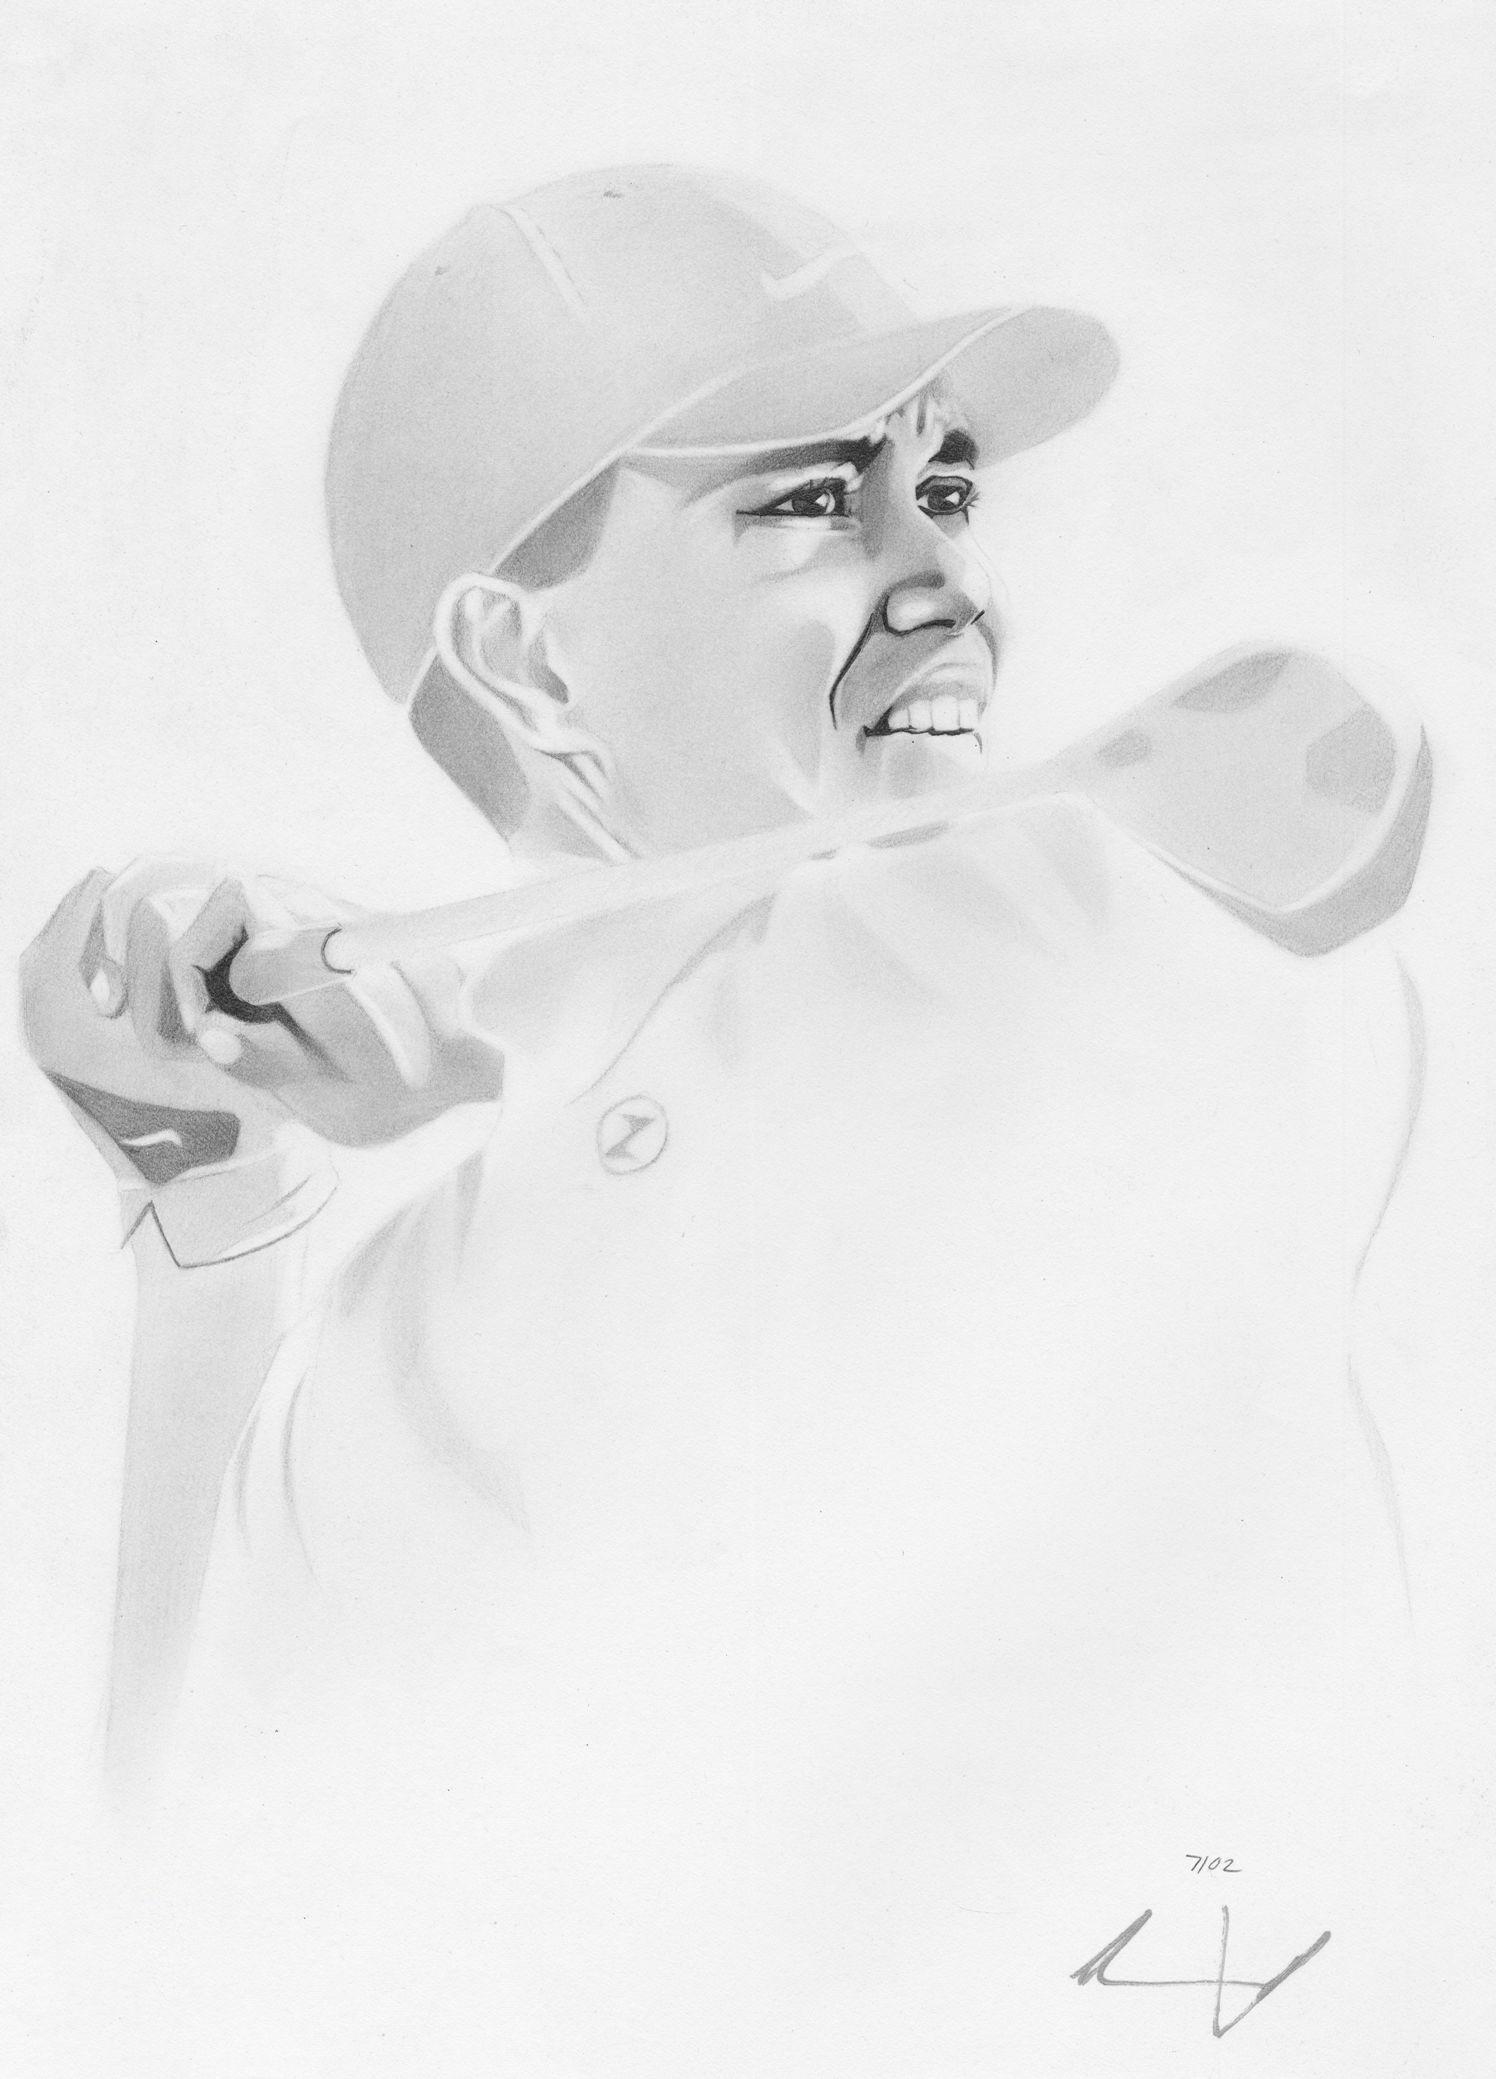 2002-07 Tiger Woods.jpg